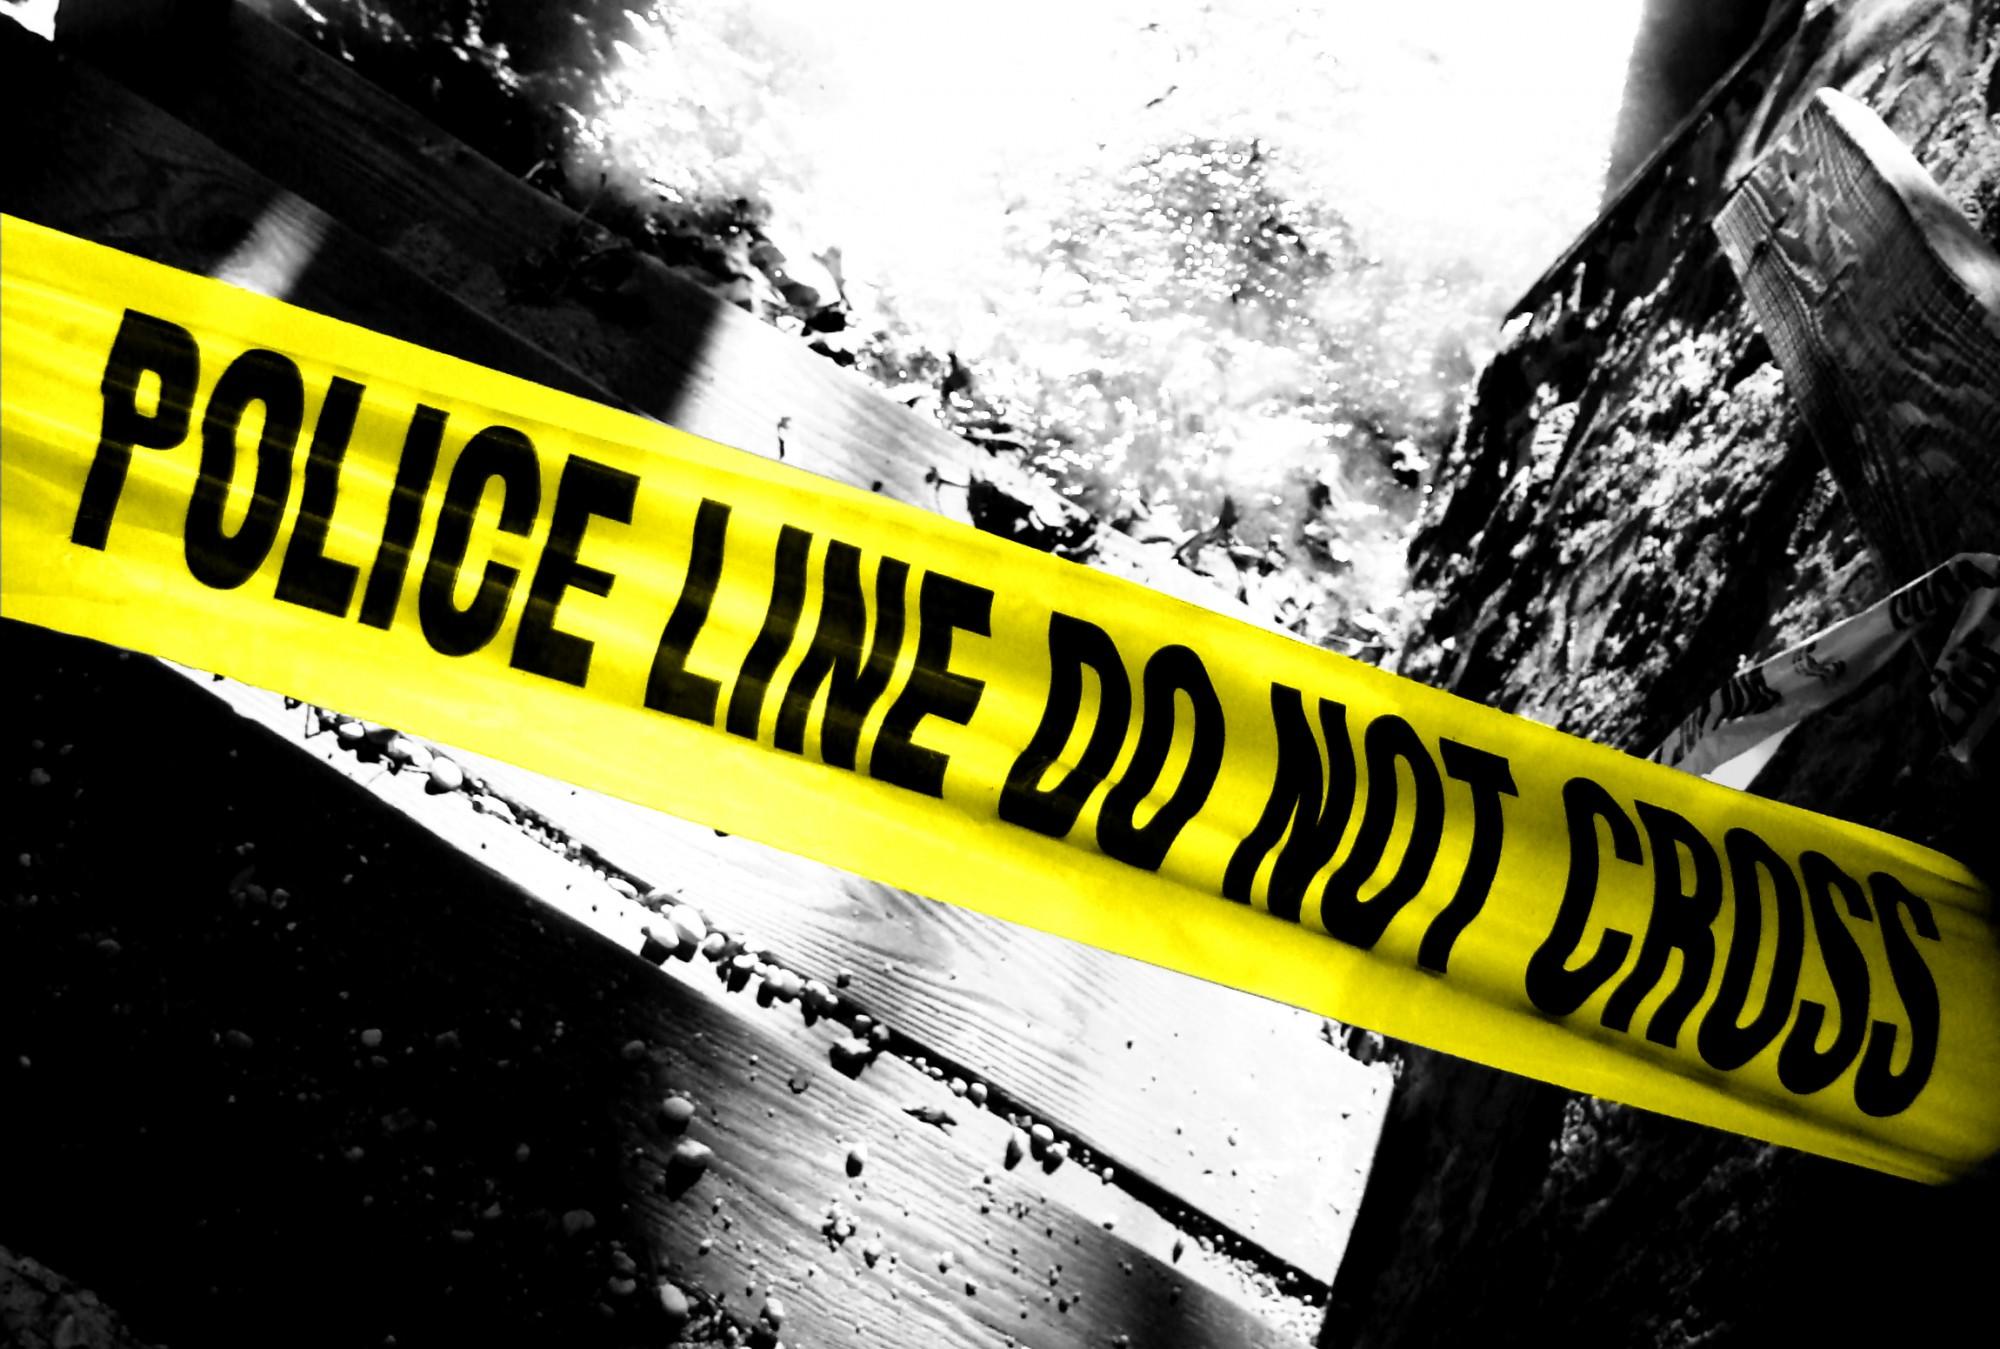 police-line-do-not-cross-tape-at-crime-scene-1-2000x1349_9.jpg